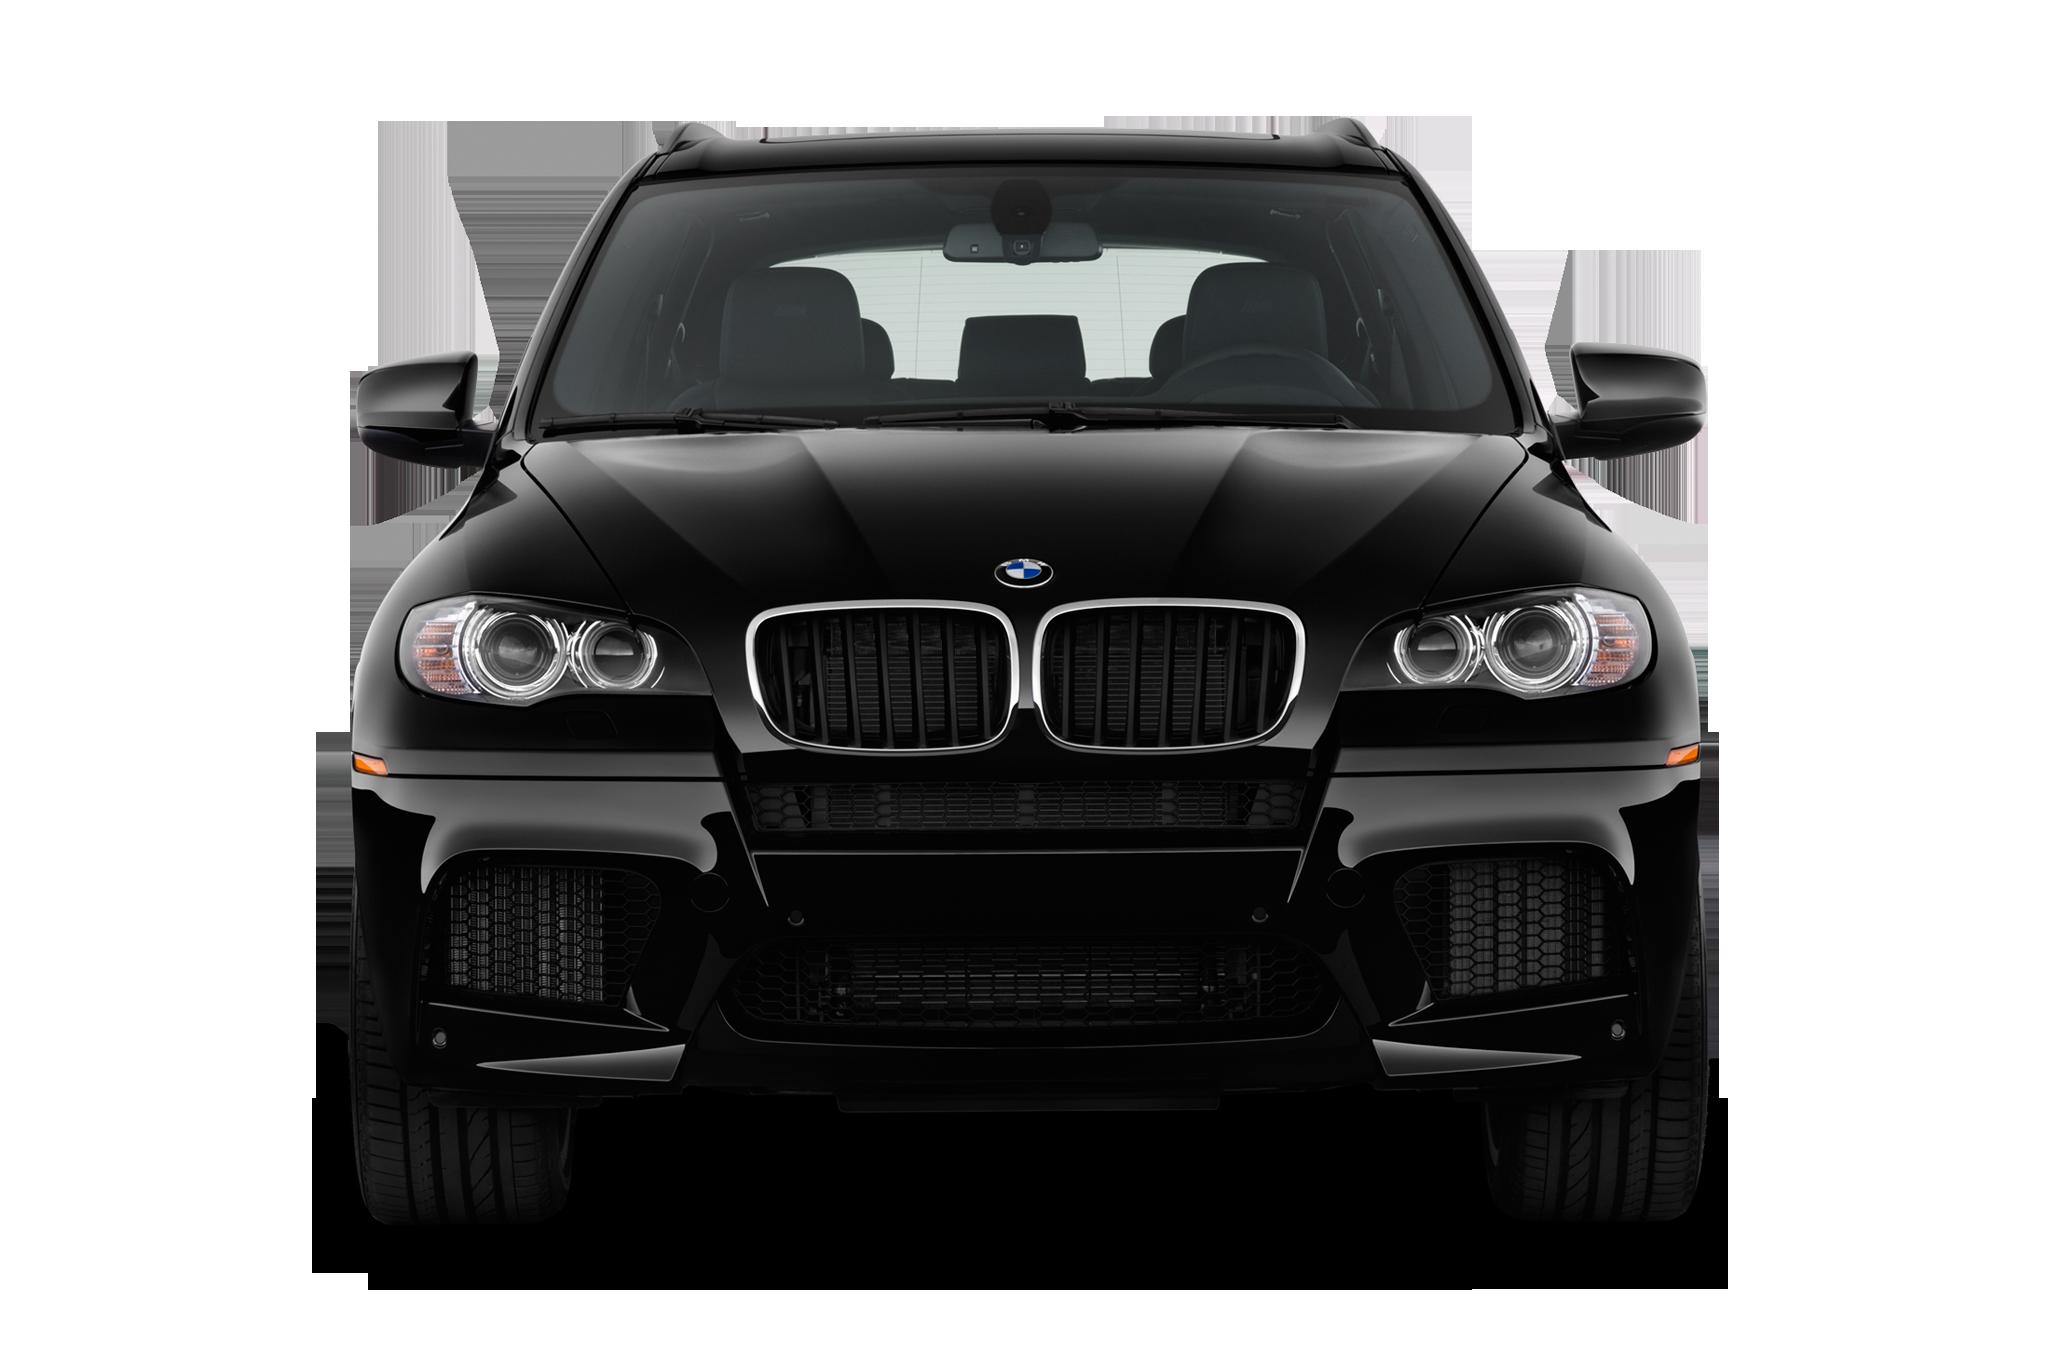 2010 Bmw X5 Xdrive35d Bmw Luxury Crossover Suv Review Automobile Magazine